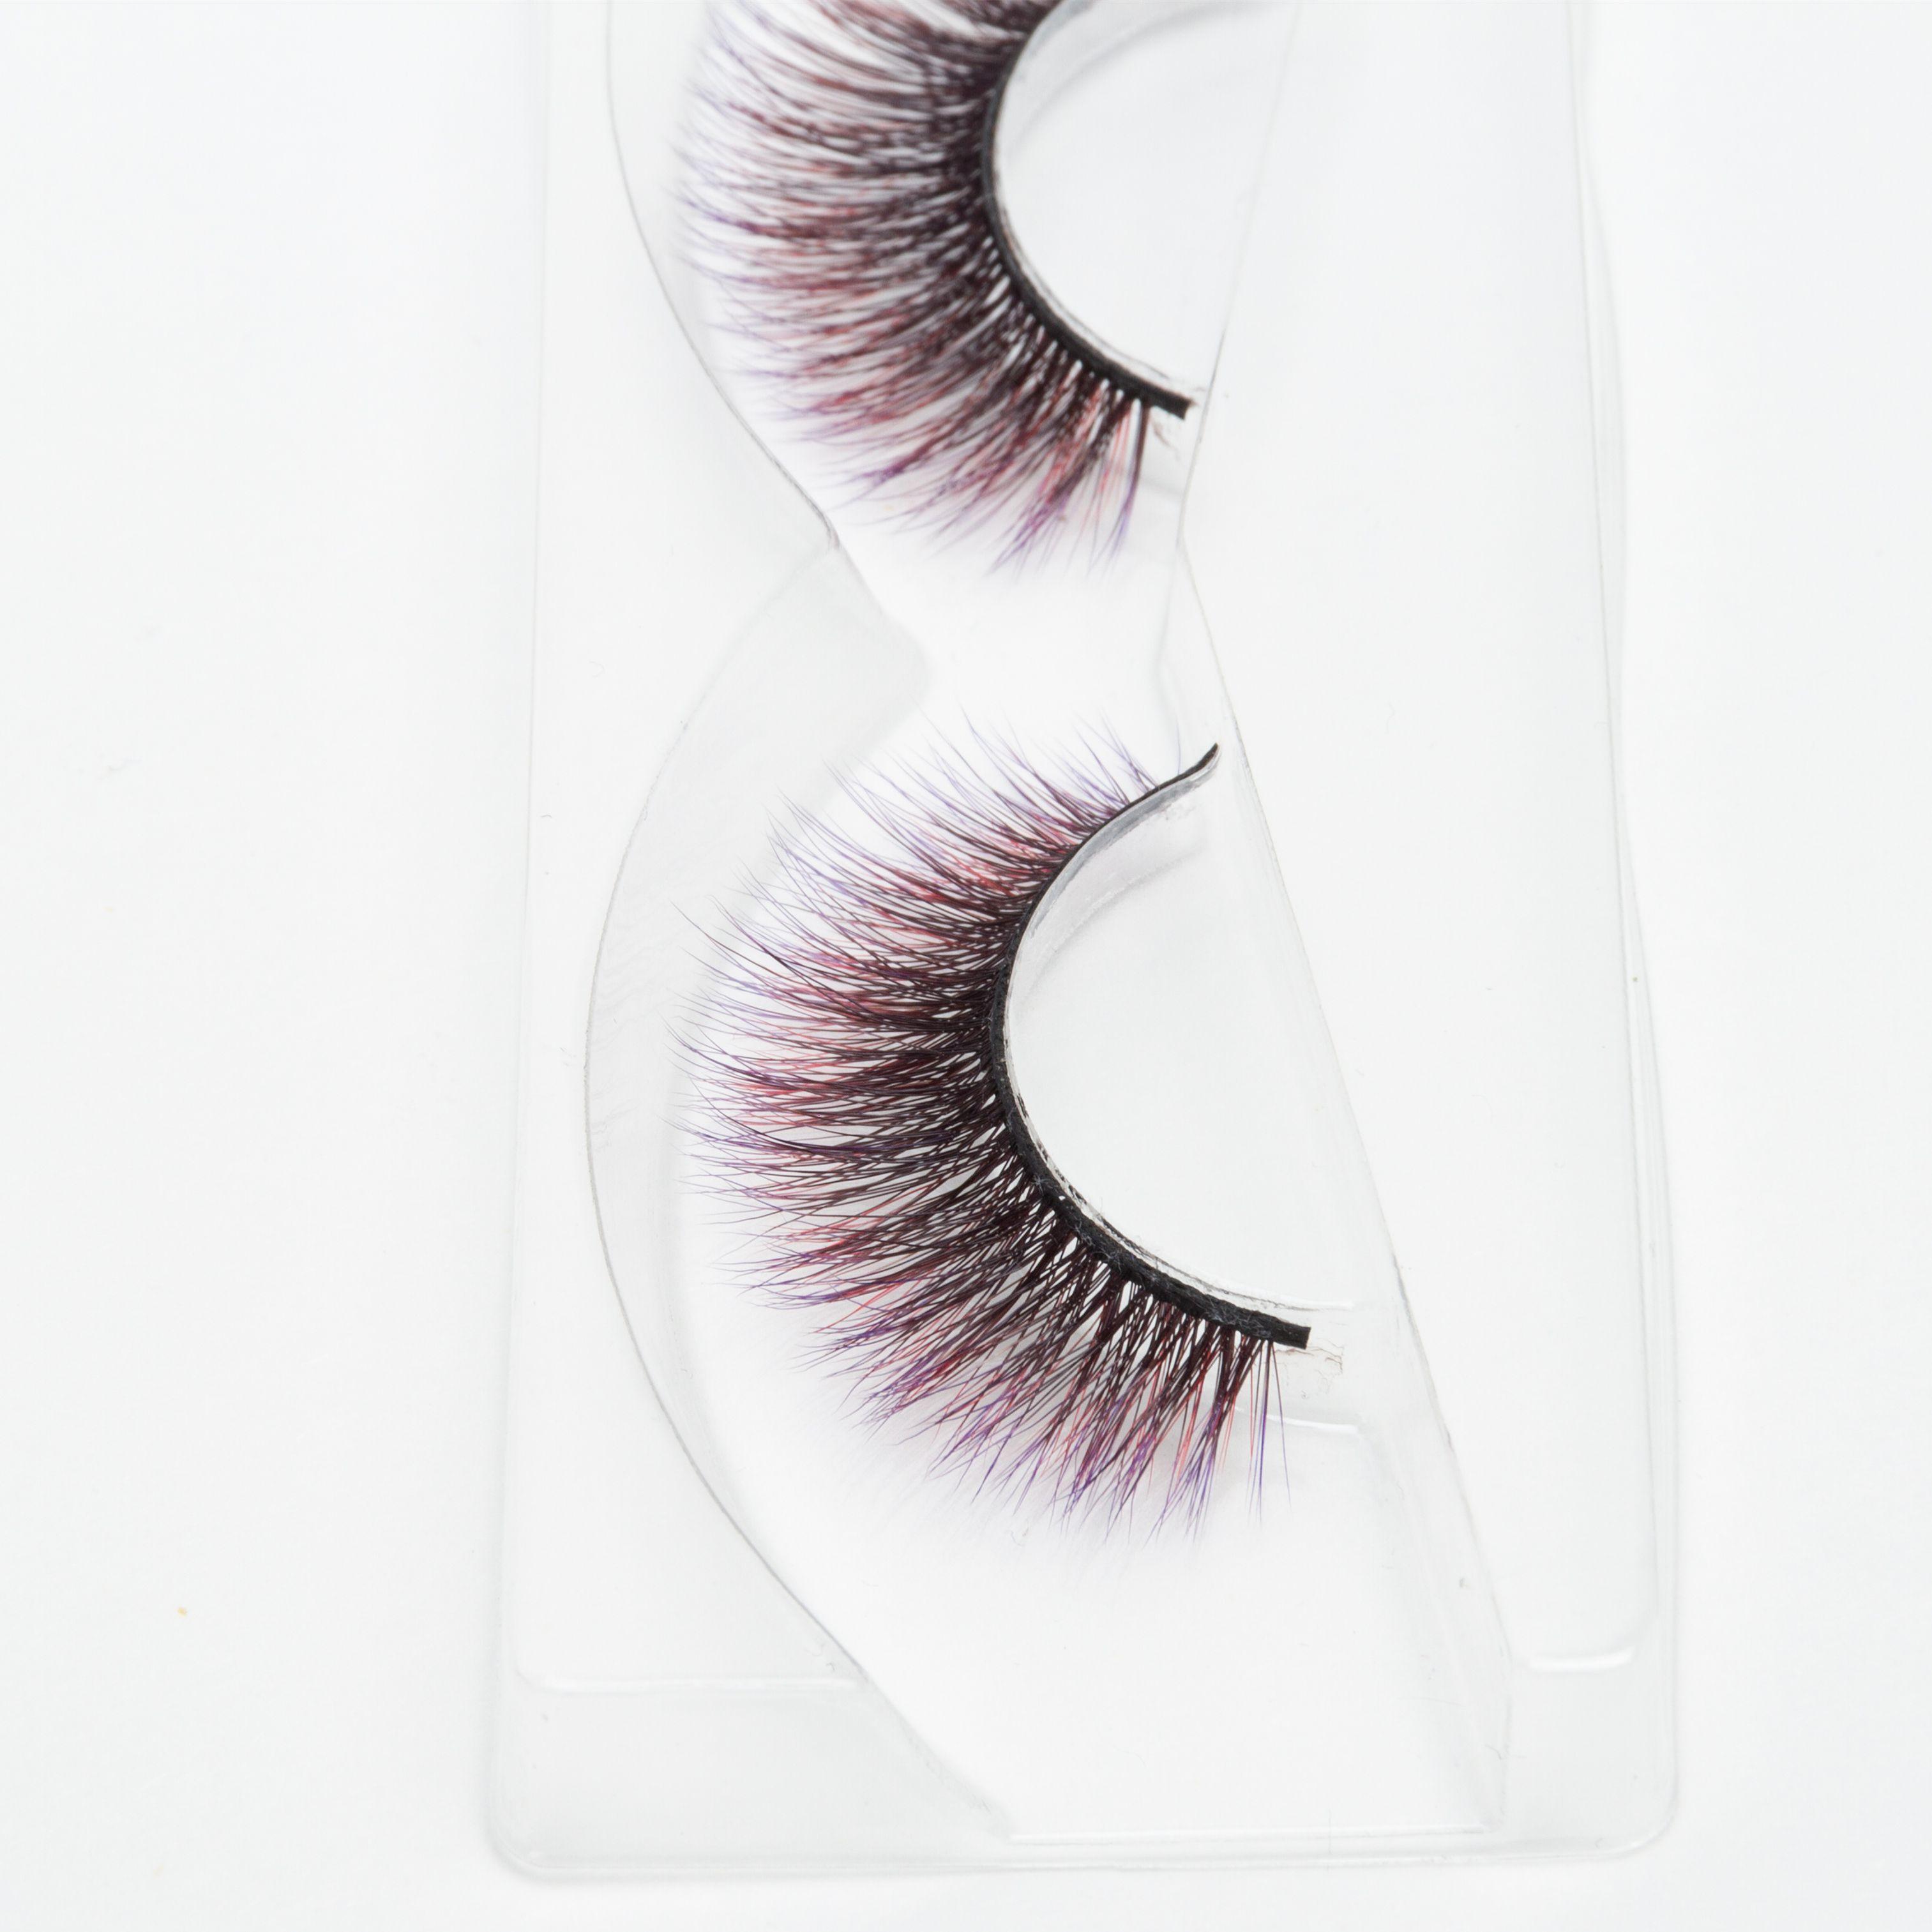 Seashine beauty 3d silk FANCY color lashes factory price 3d colorful silk lashes false eyelashes free shipping C6